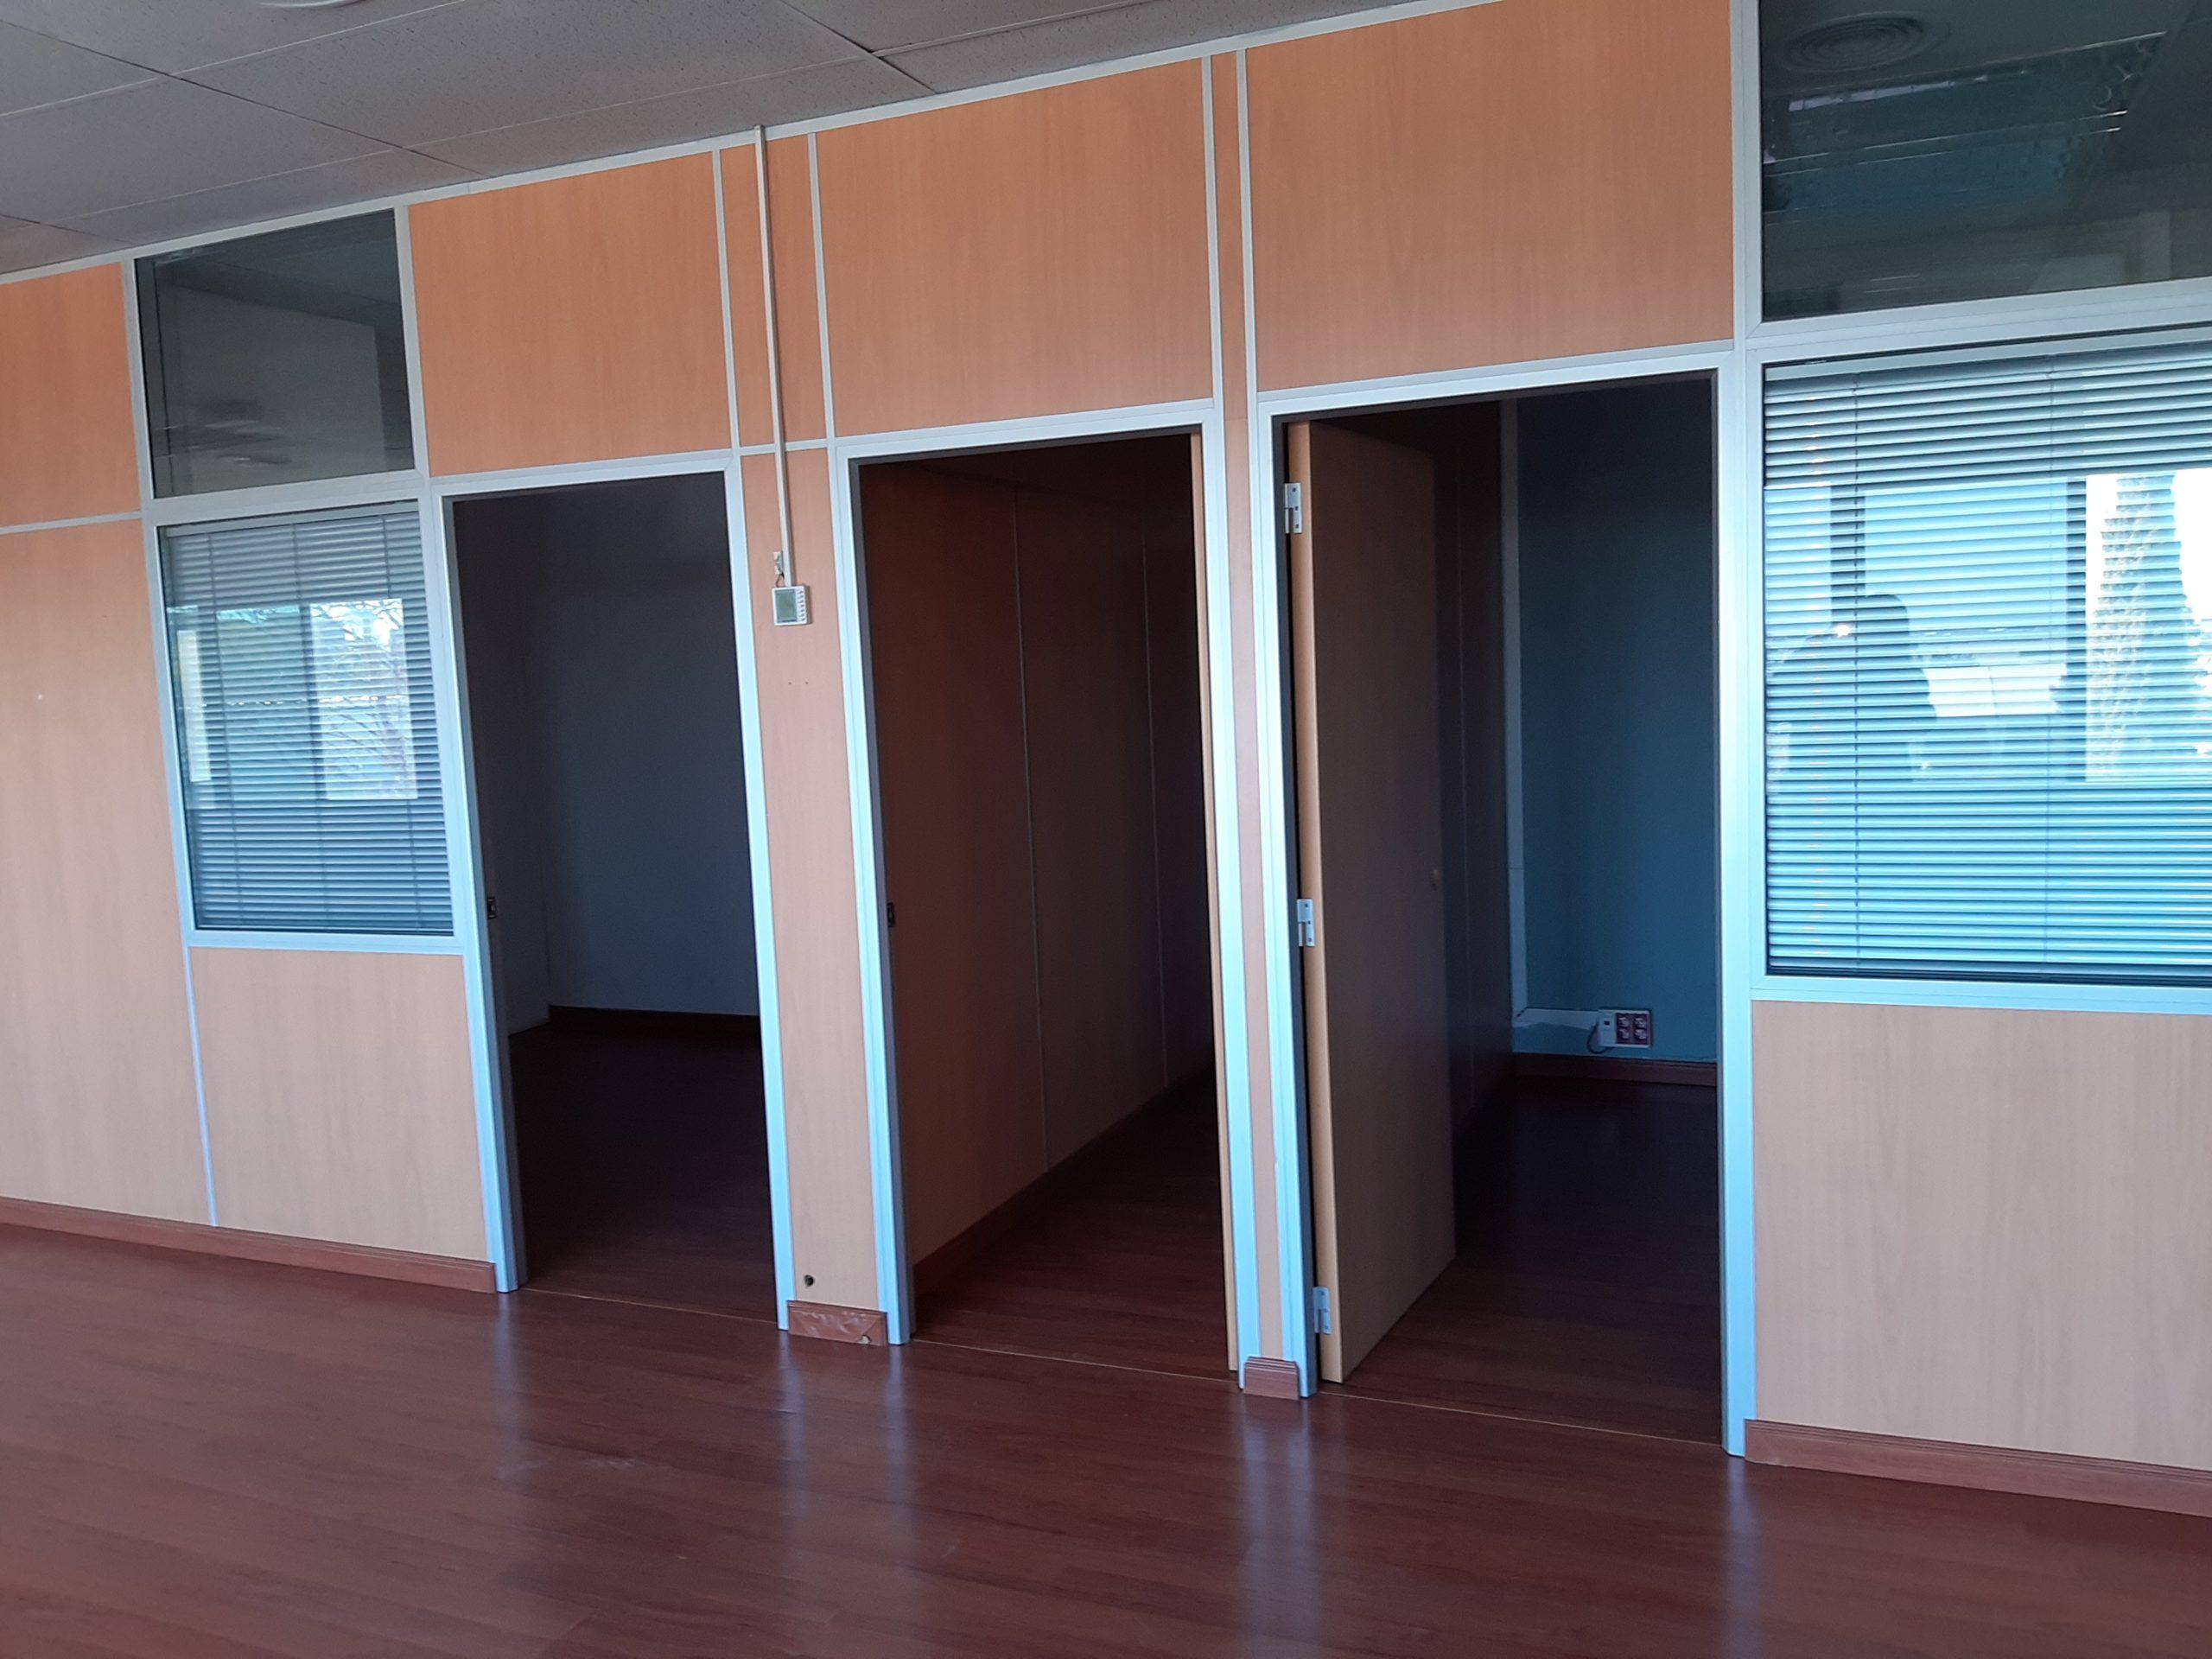 Oficina representativa 210 metros